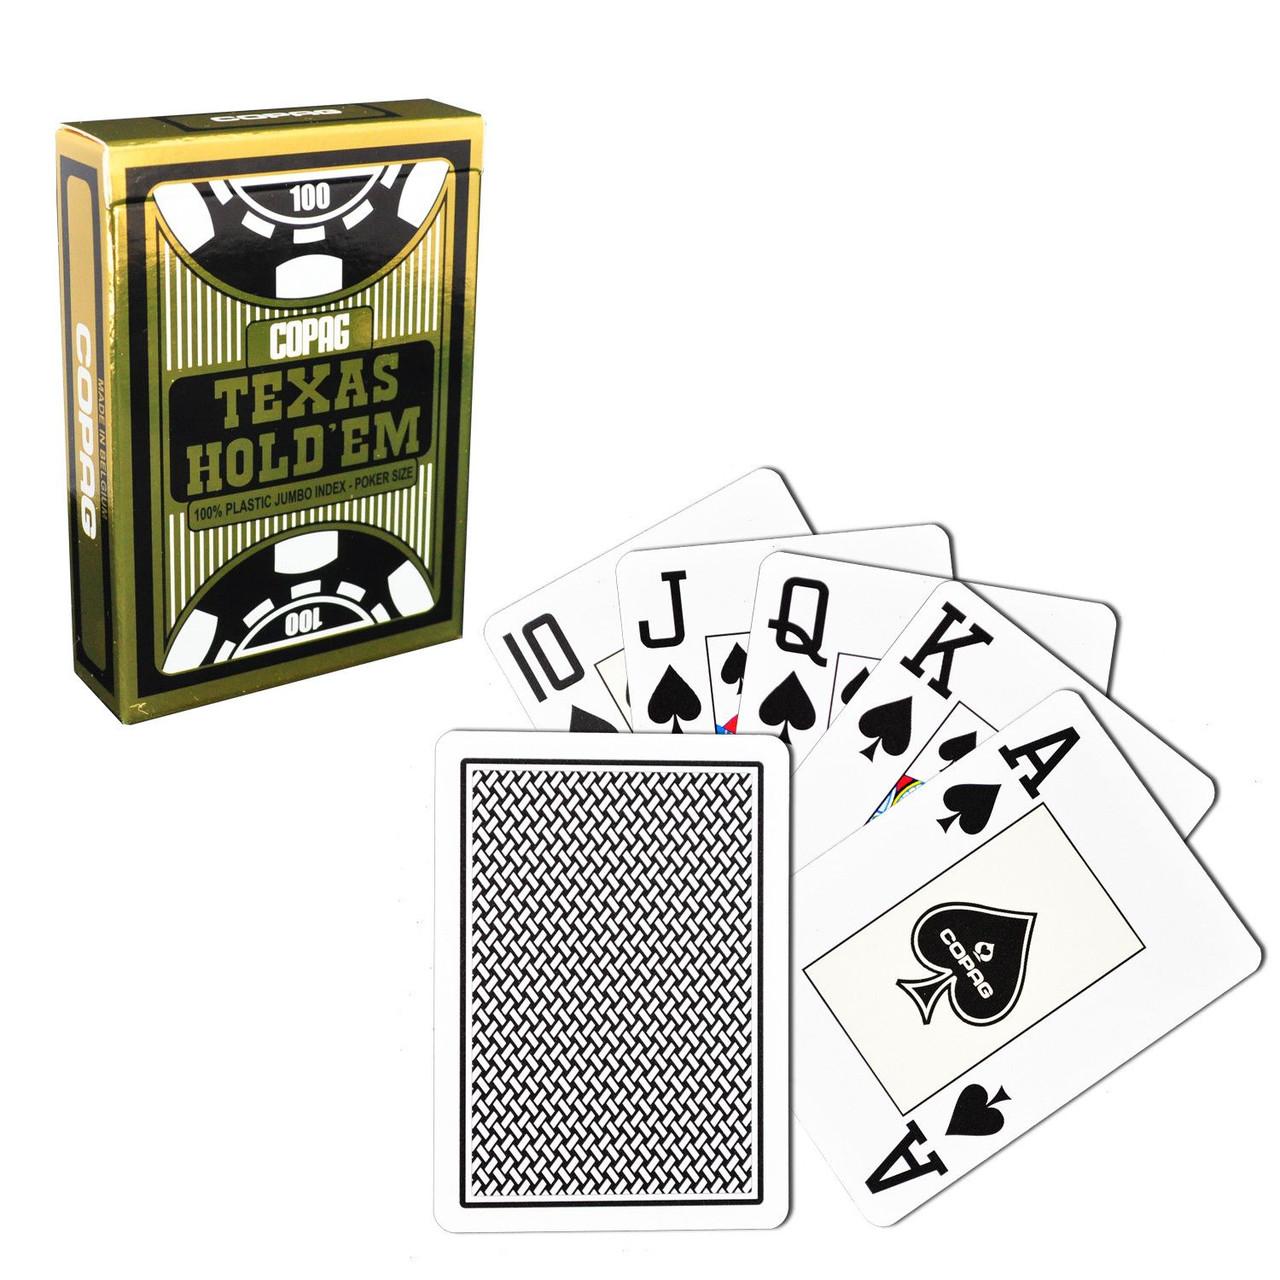 Carti profesionale COPAG TEXAS HOLD'EM GOLD 100% plastic cu JUMBO index si spate negru